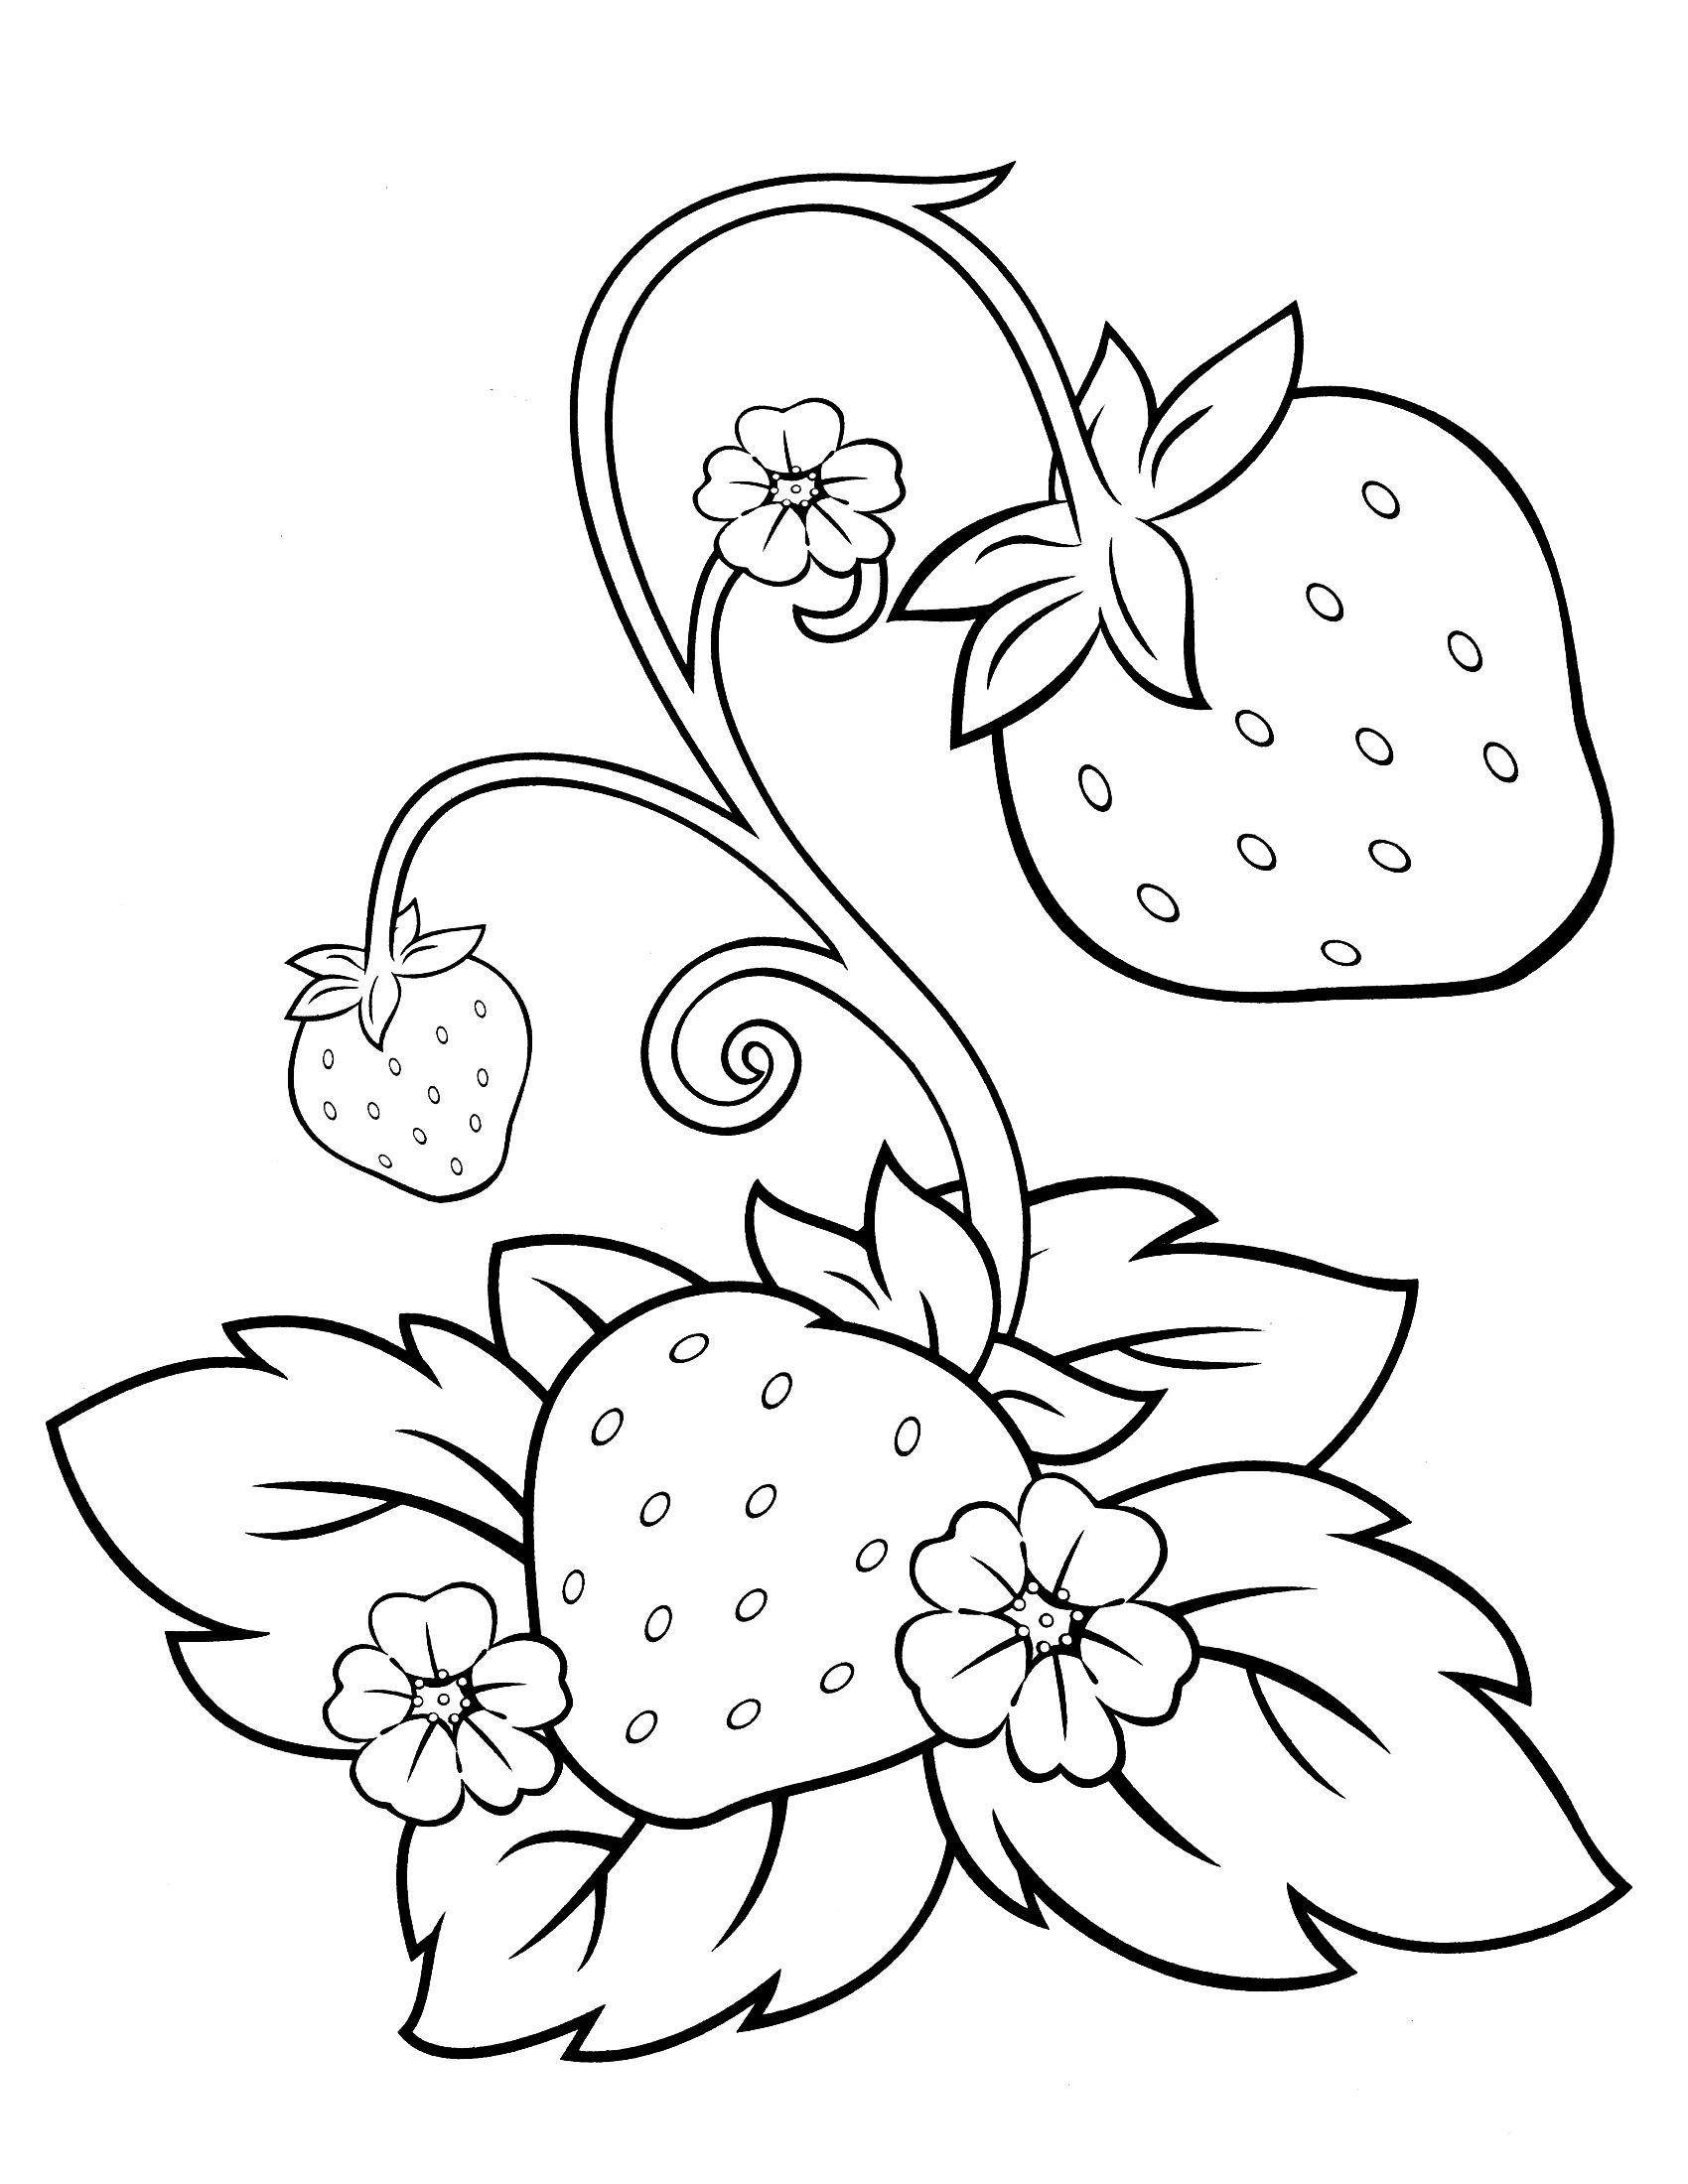 Strawberry Shortcake Coloring Page Ausmalbilder Strawberry